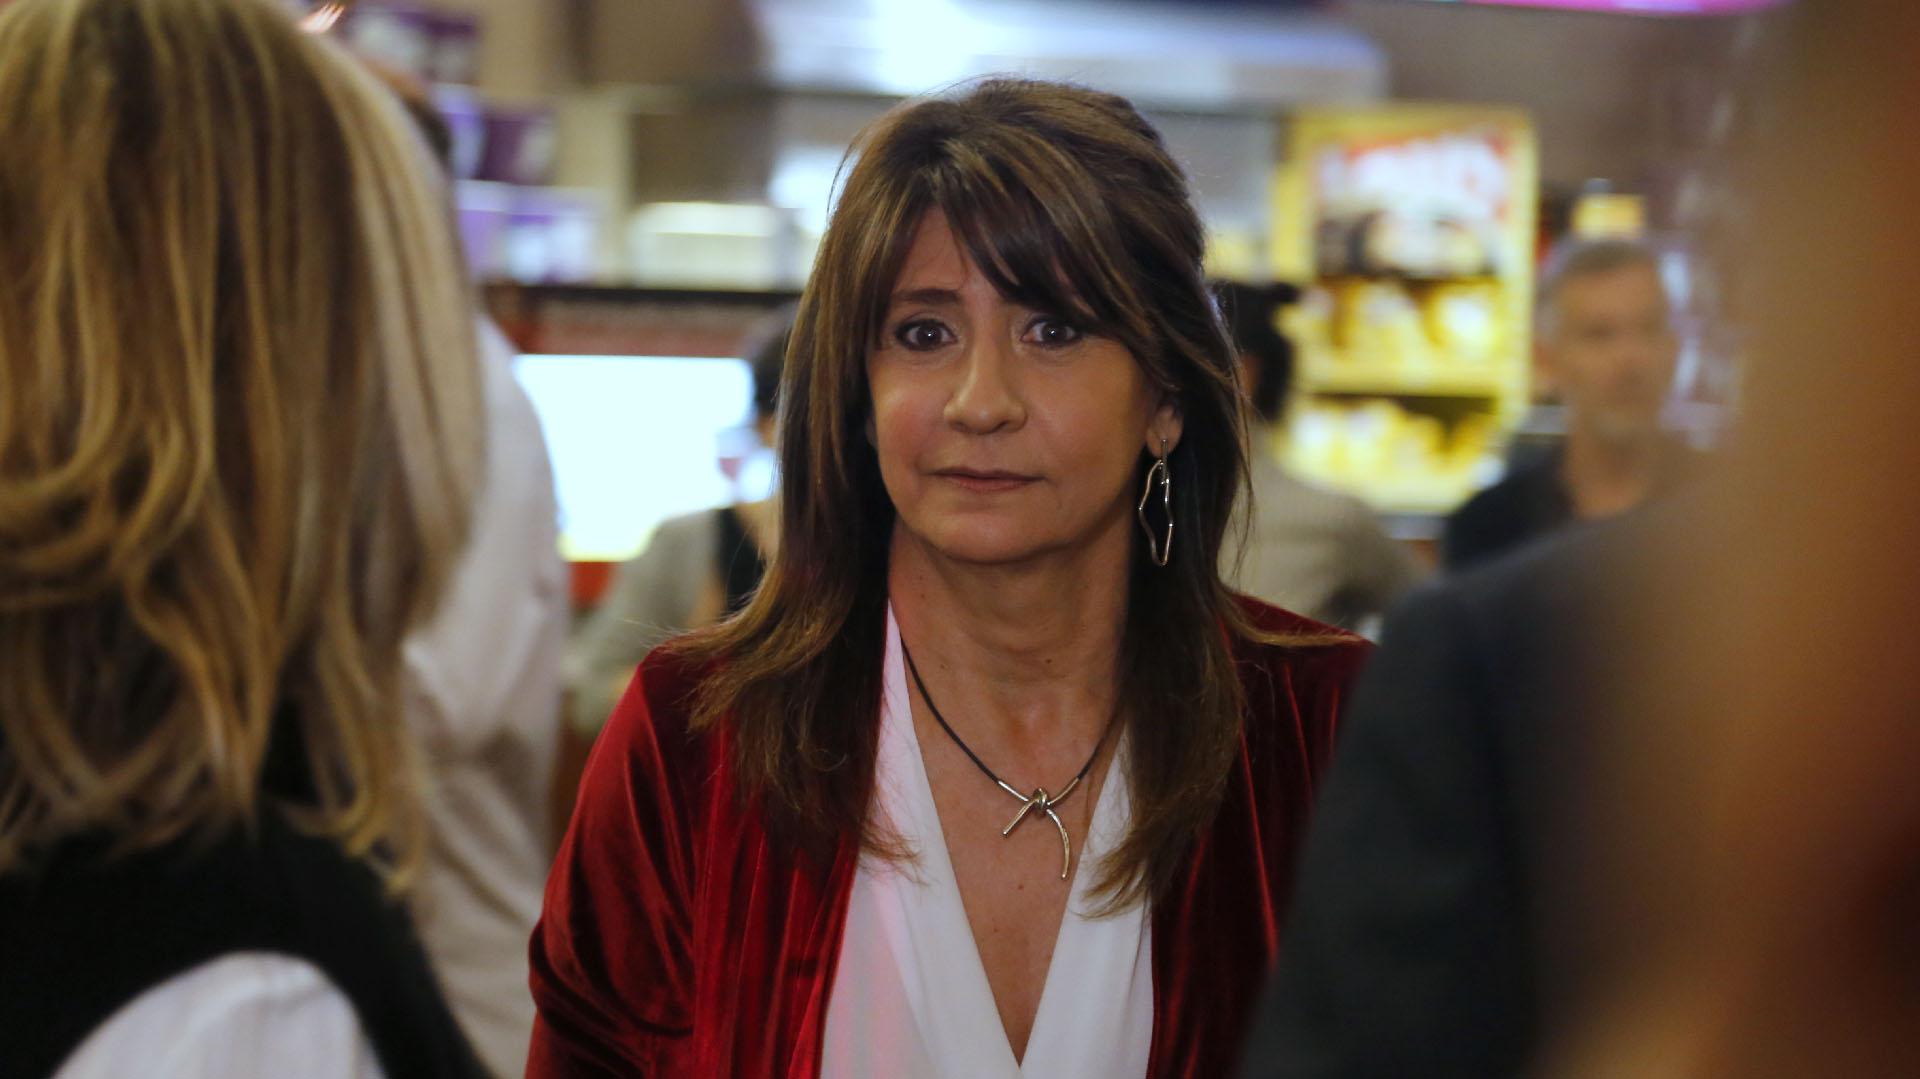 Agustina Macri es la hija mayor de Mauricio Macri, fruto del primer matrimonio del presidente con Ivonne Bordeu (foto)